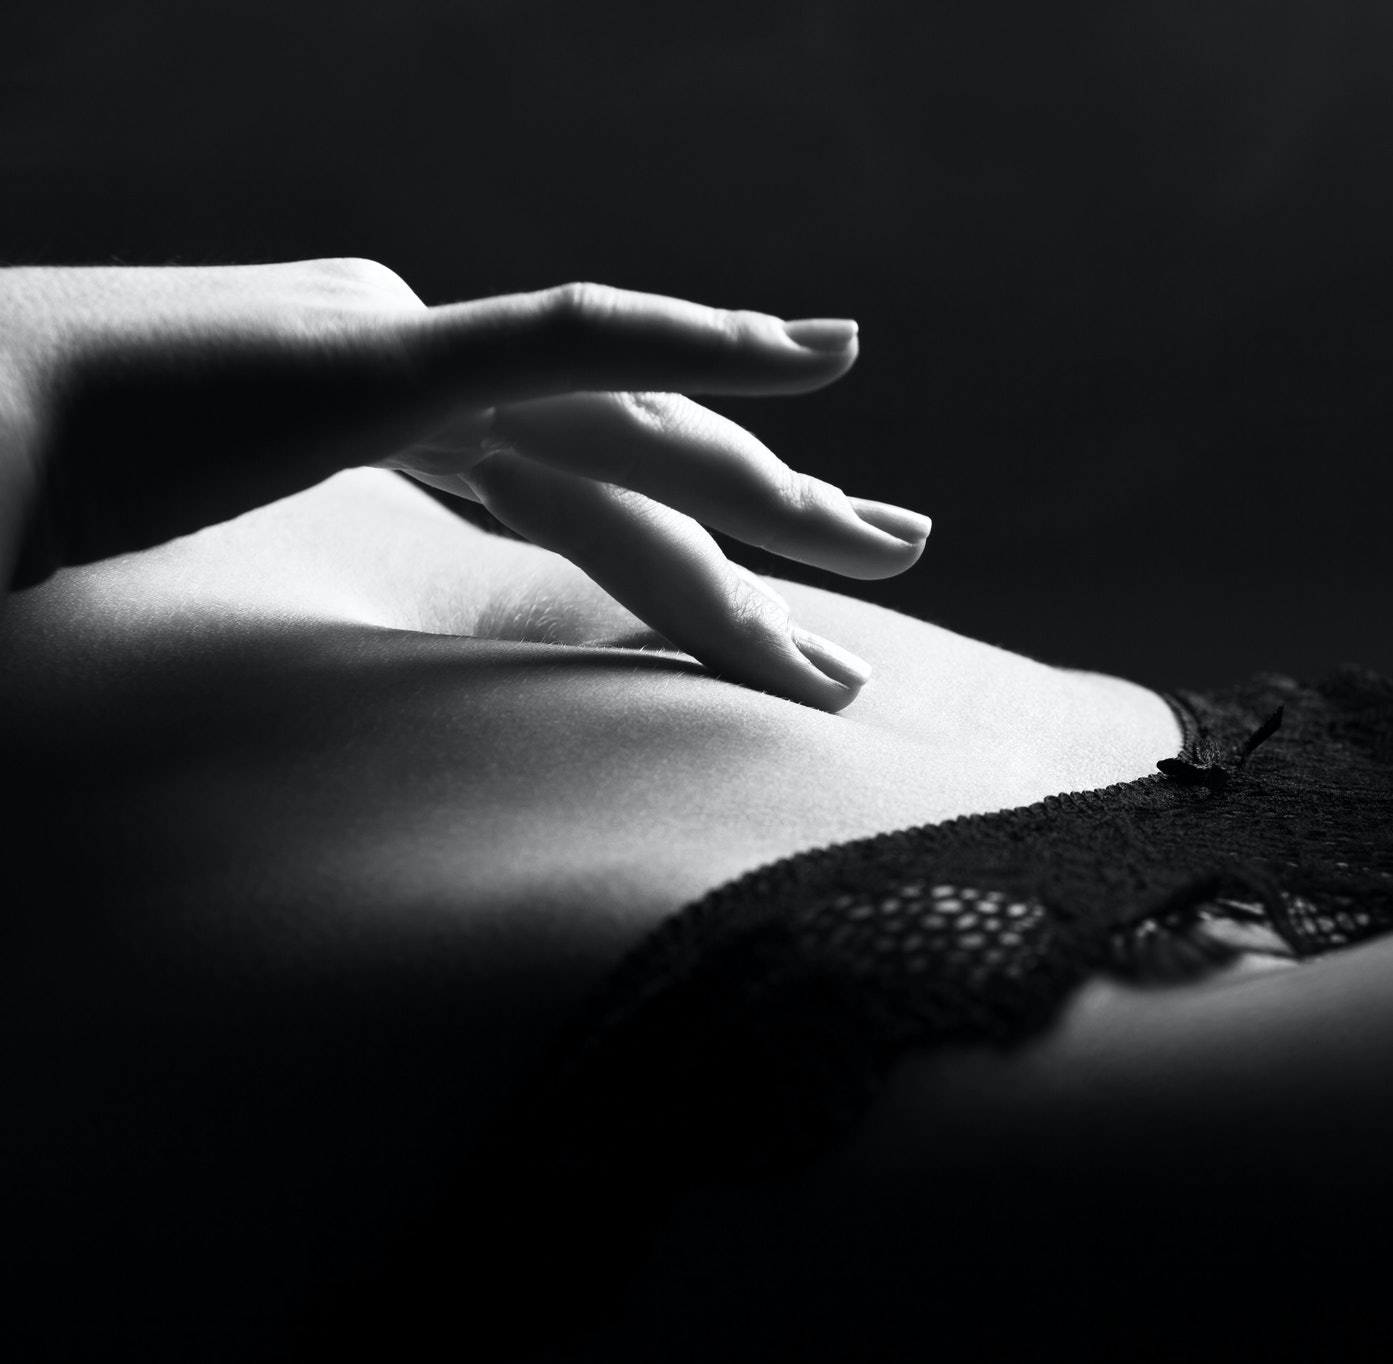 Erotic bikini photography